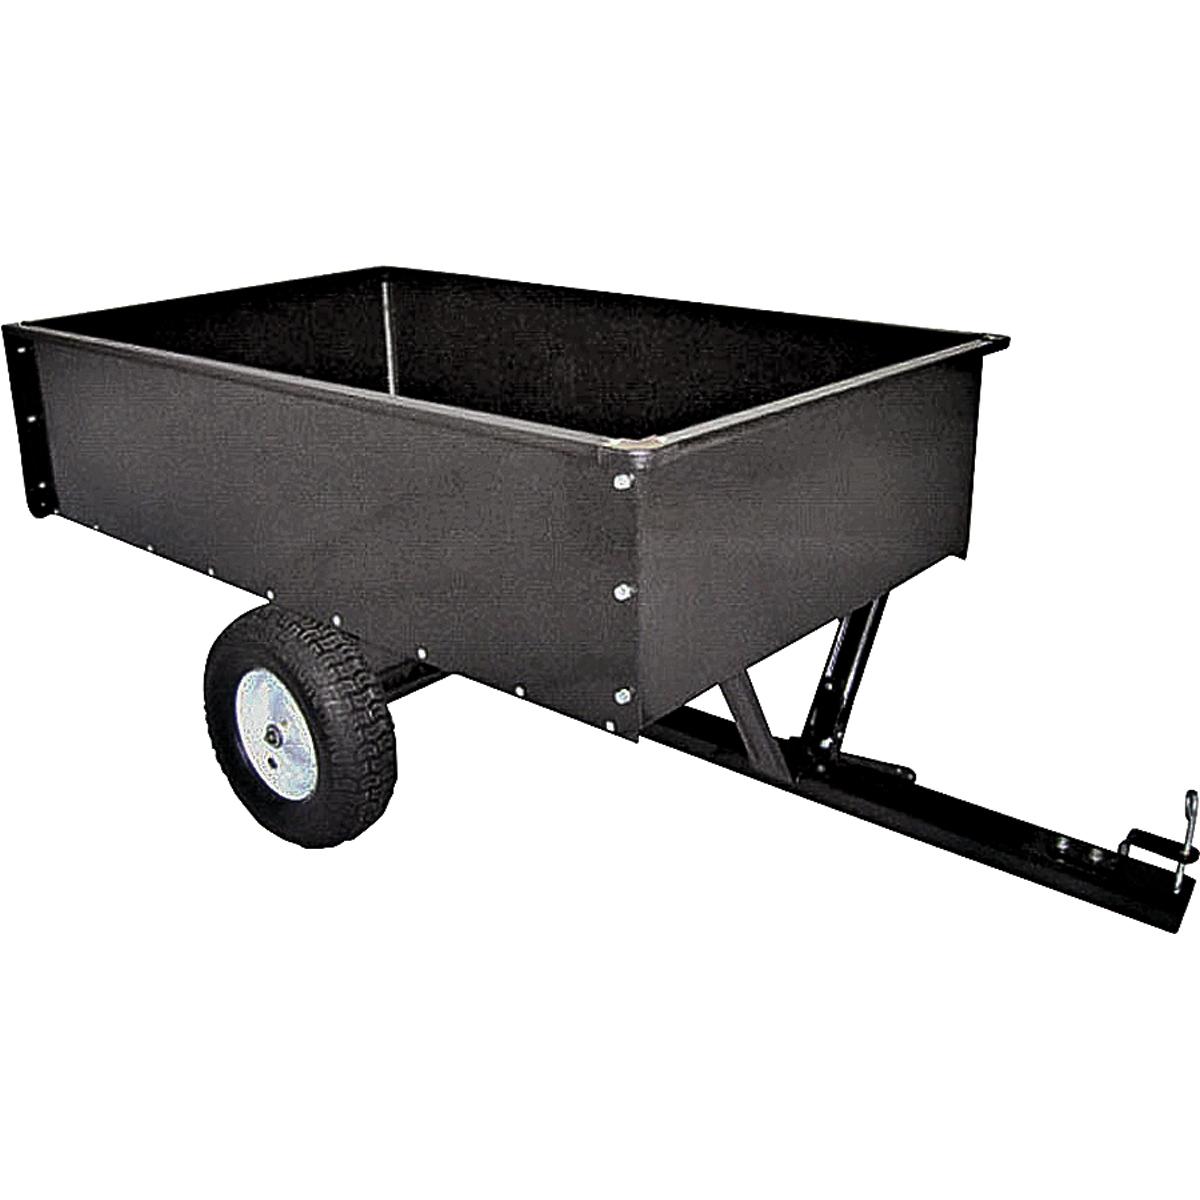 Picture of Vulcan YTL-012-508 Dump Cart, 400 lb, 40-1/2 L x30-3/4 W x 13 H in Deck, Steel Deck, 2 -Wheel, Pneumatic Wheel